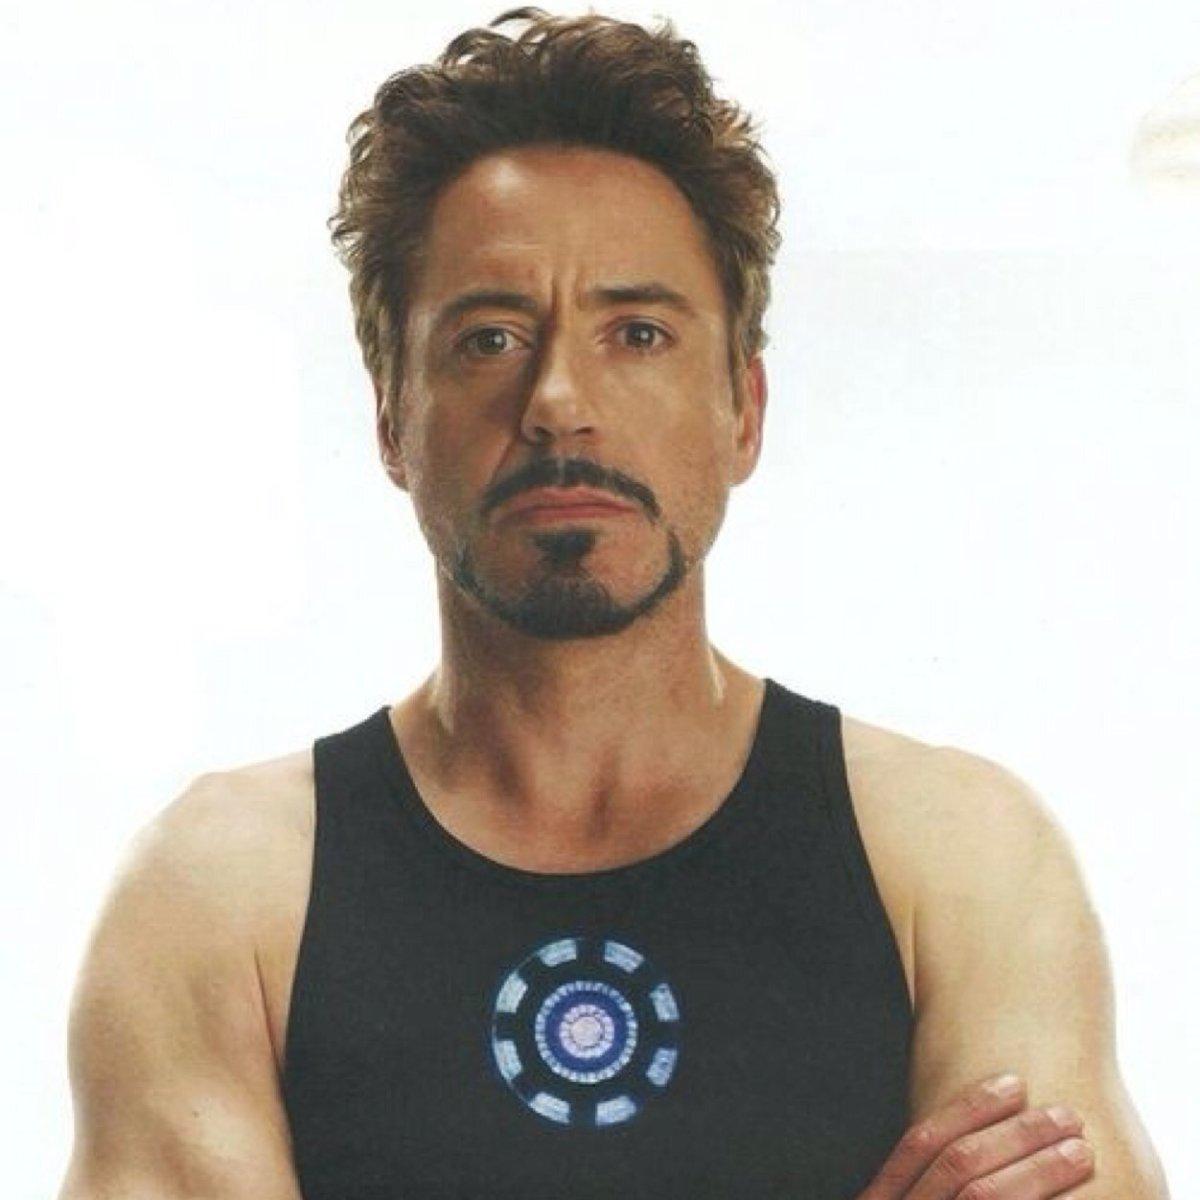 Tony Stark: Case Study and Psychological Assessment